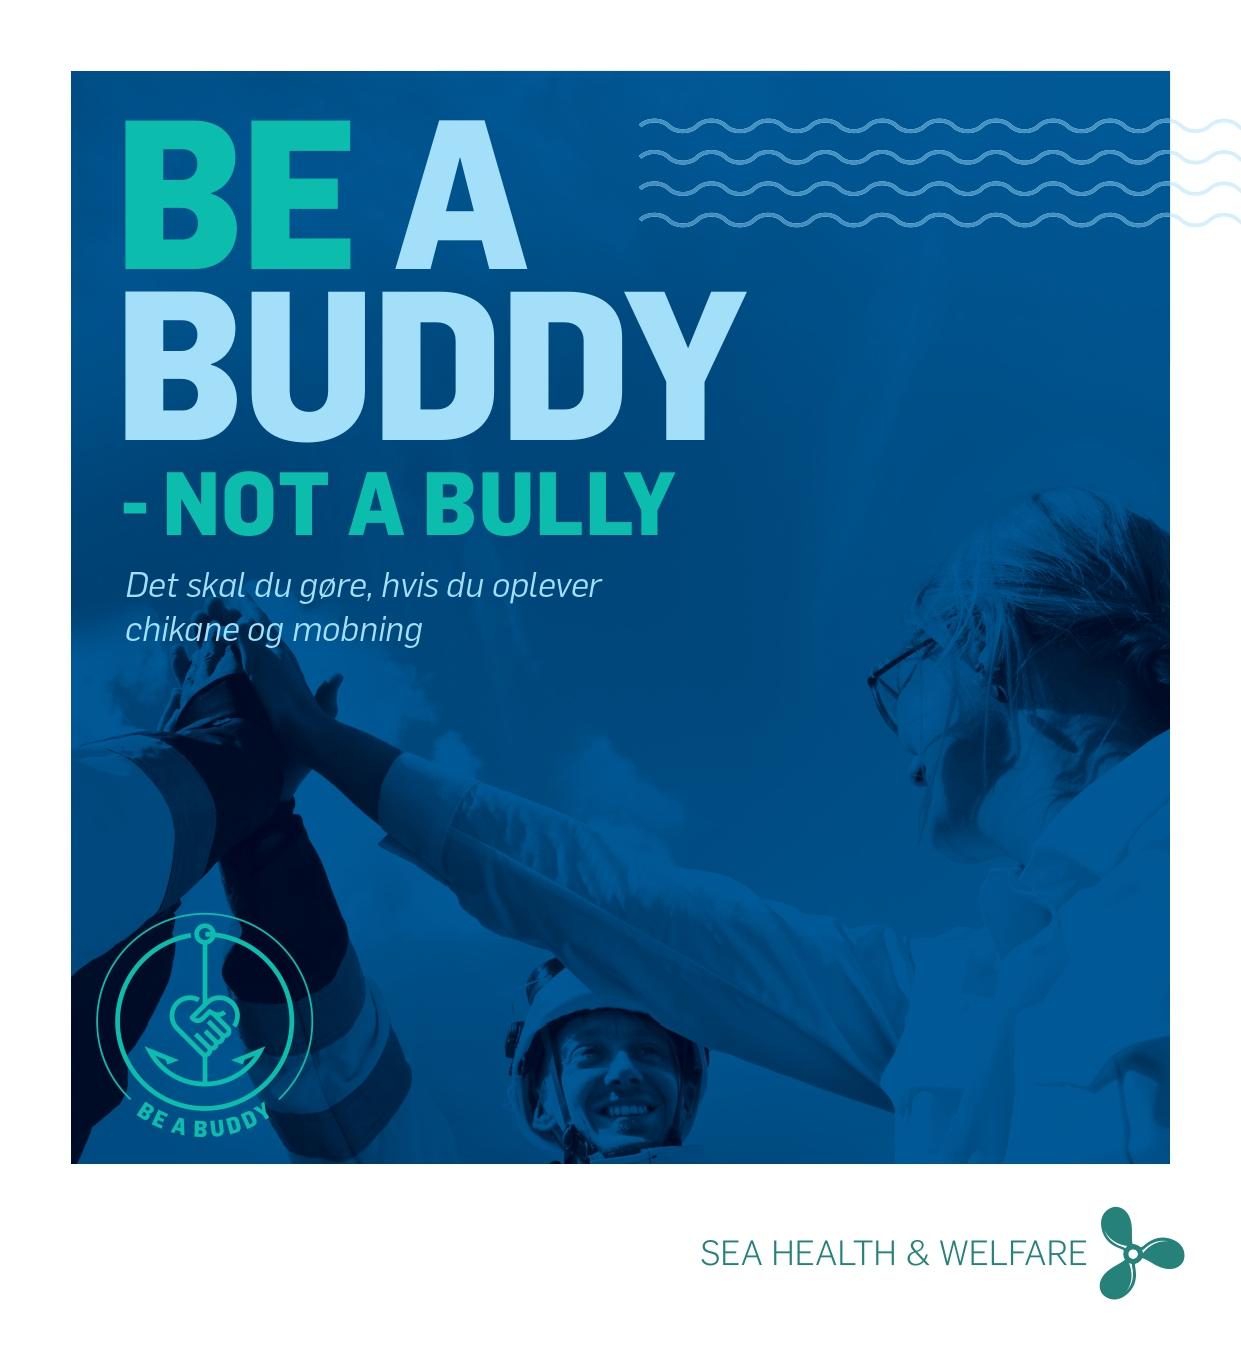 Be a buddy not a bully